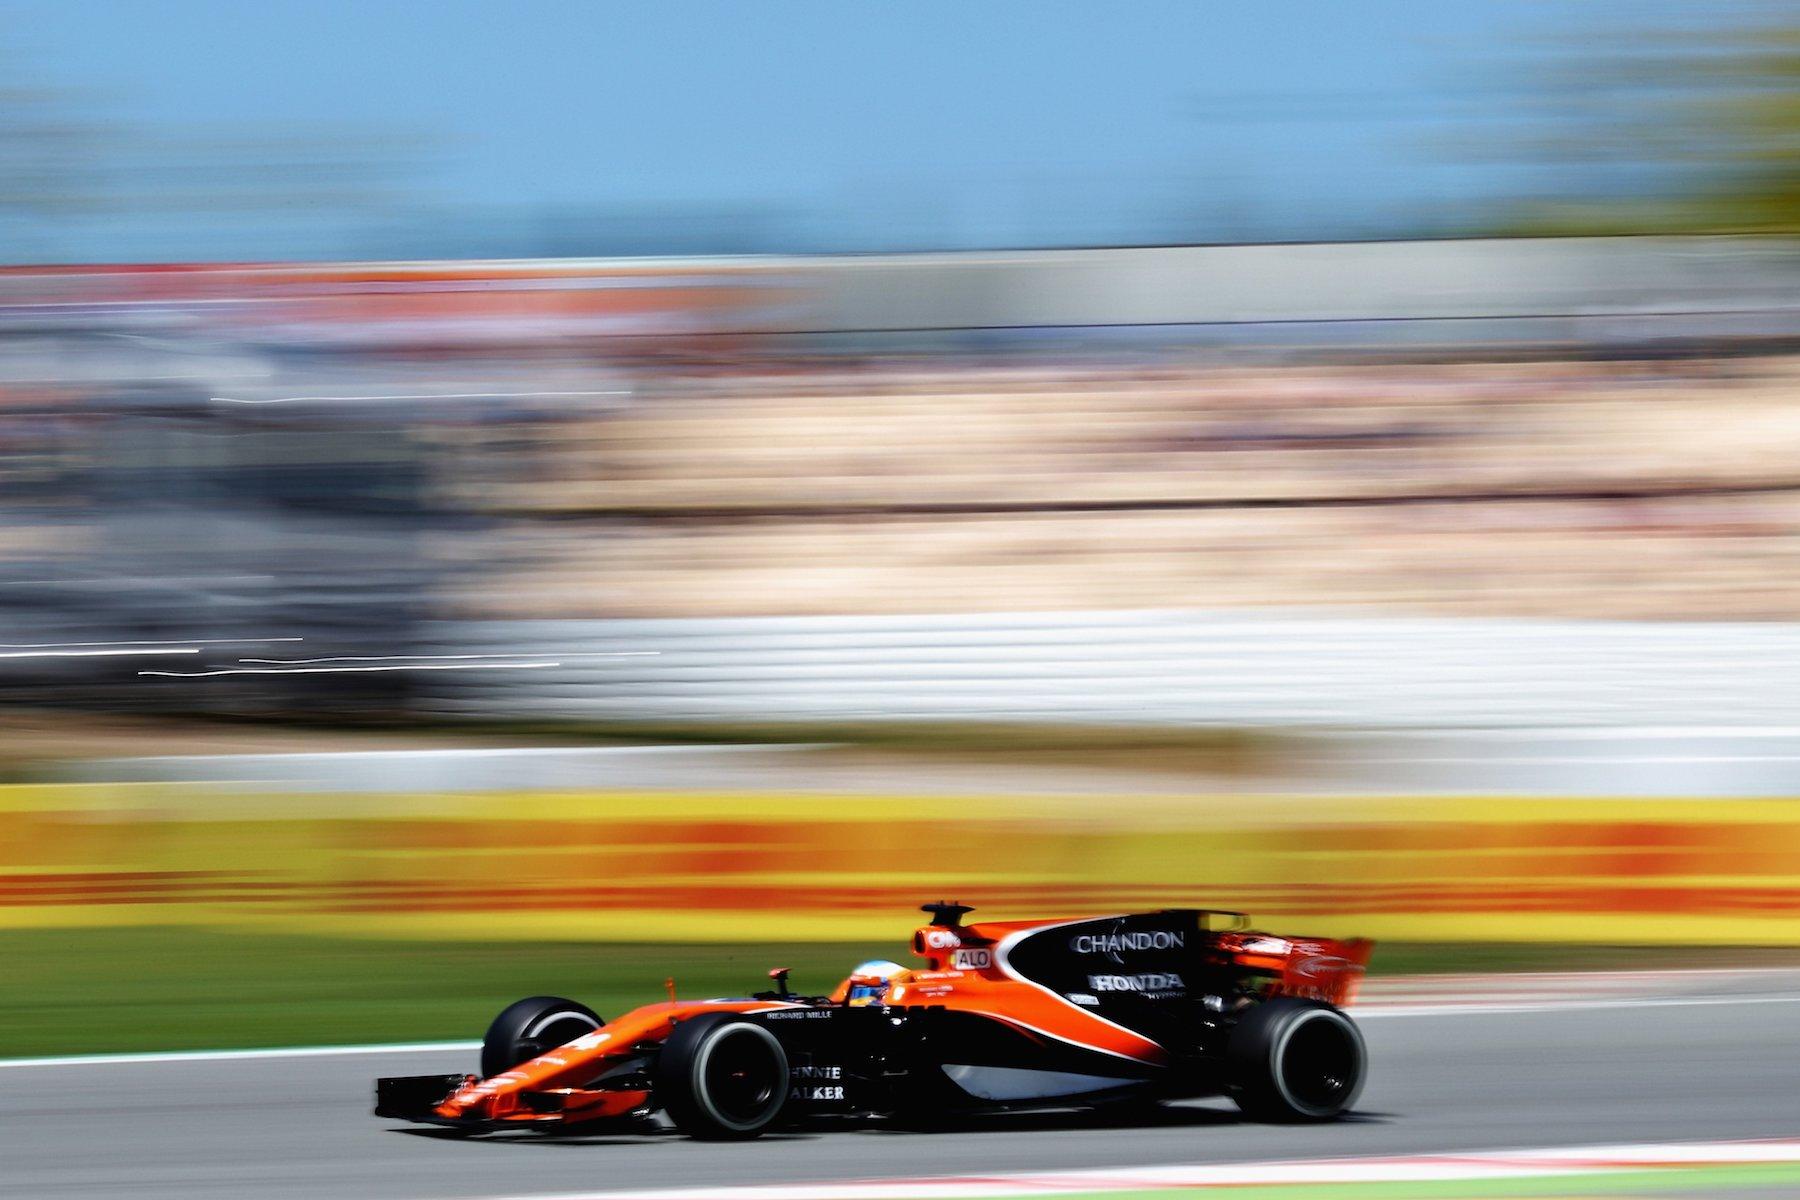 2017 Fernando Alonso | McLaren MCL32 | 2017 Spanish GP Q3 P7 1 copy.jpg